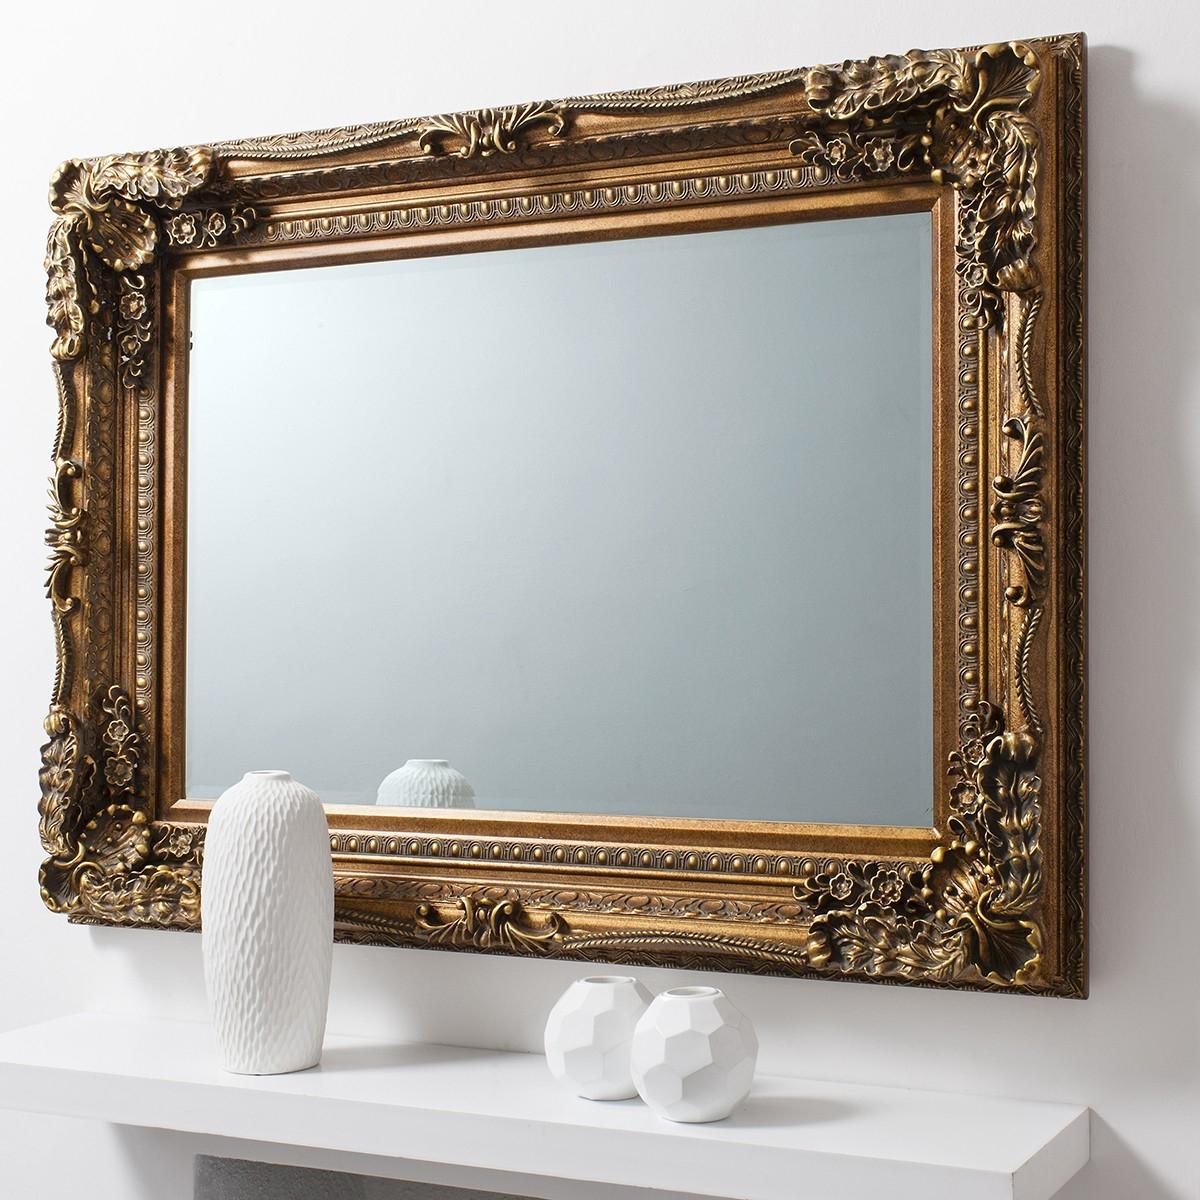 Versailles Baroque Mirror From 189 Luxury Wall Mirrors Ashden With Regard To Baroque Mirror (Image 15 of 15)